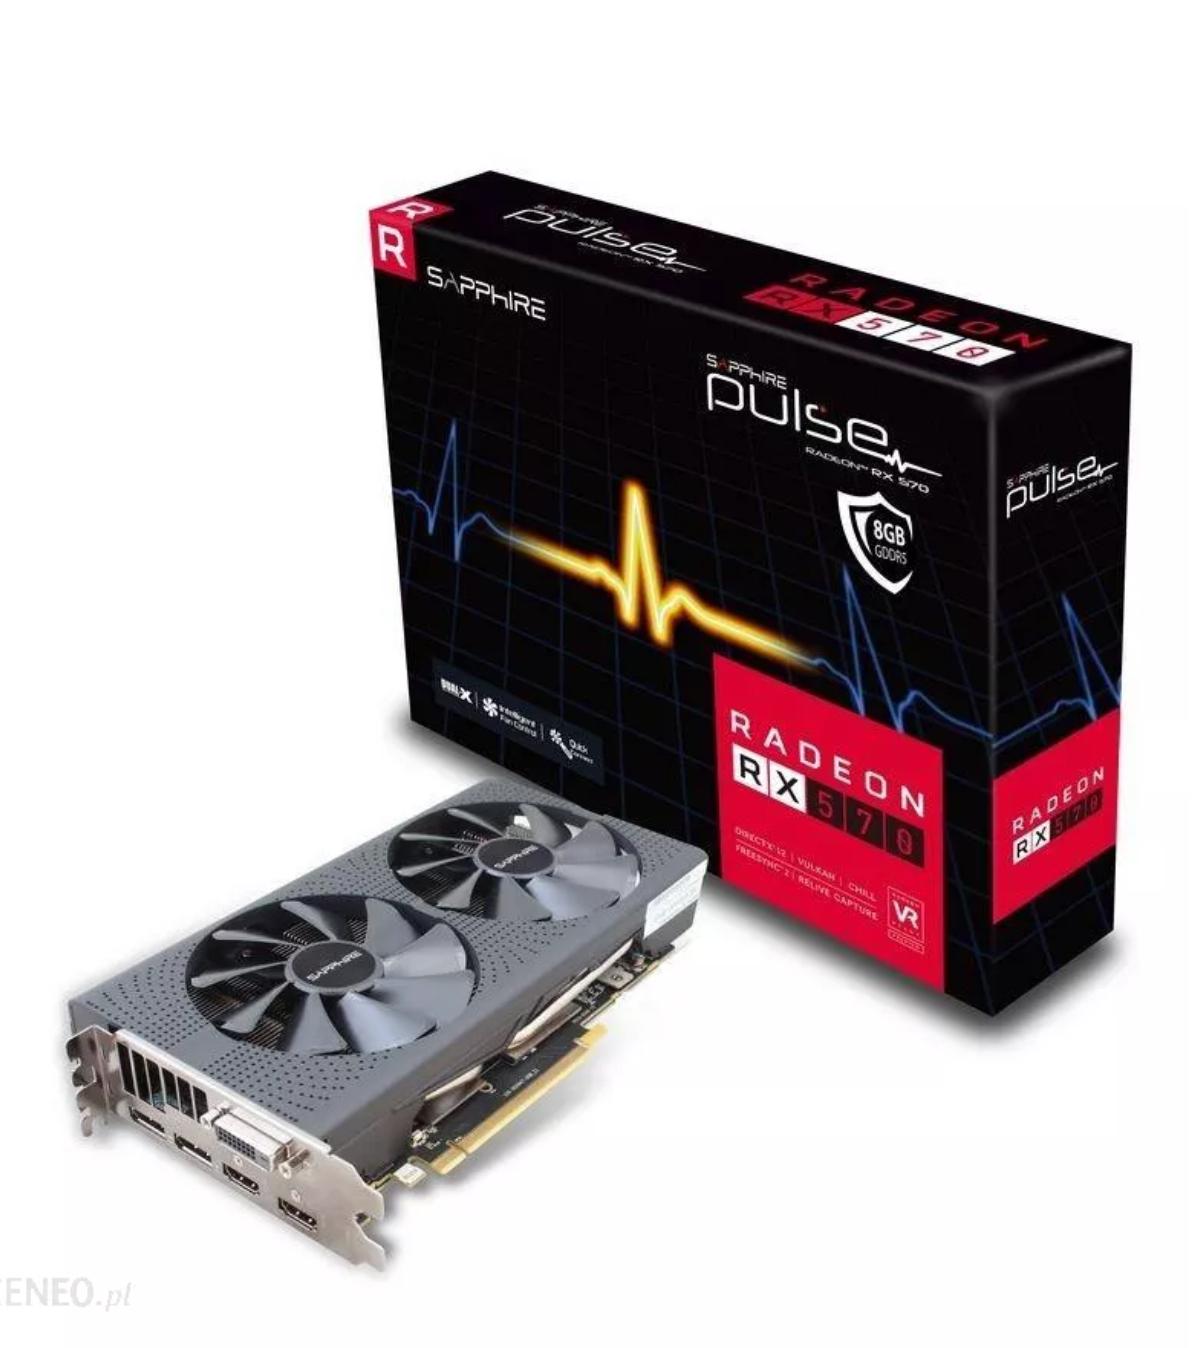 Sapphire Radeon RX 570 Pulse 8GB GDDR5. Amazon.de